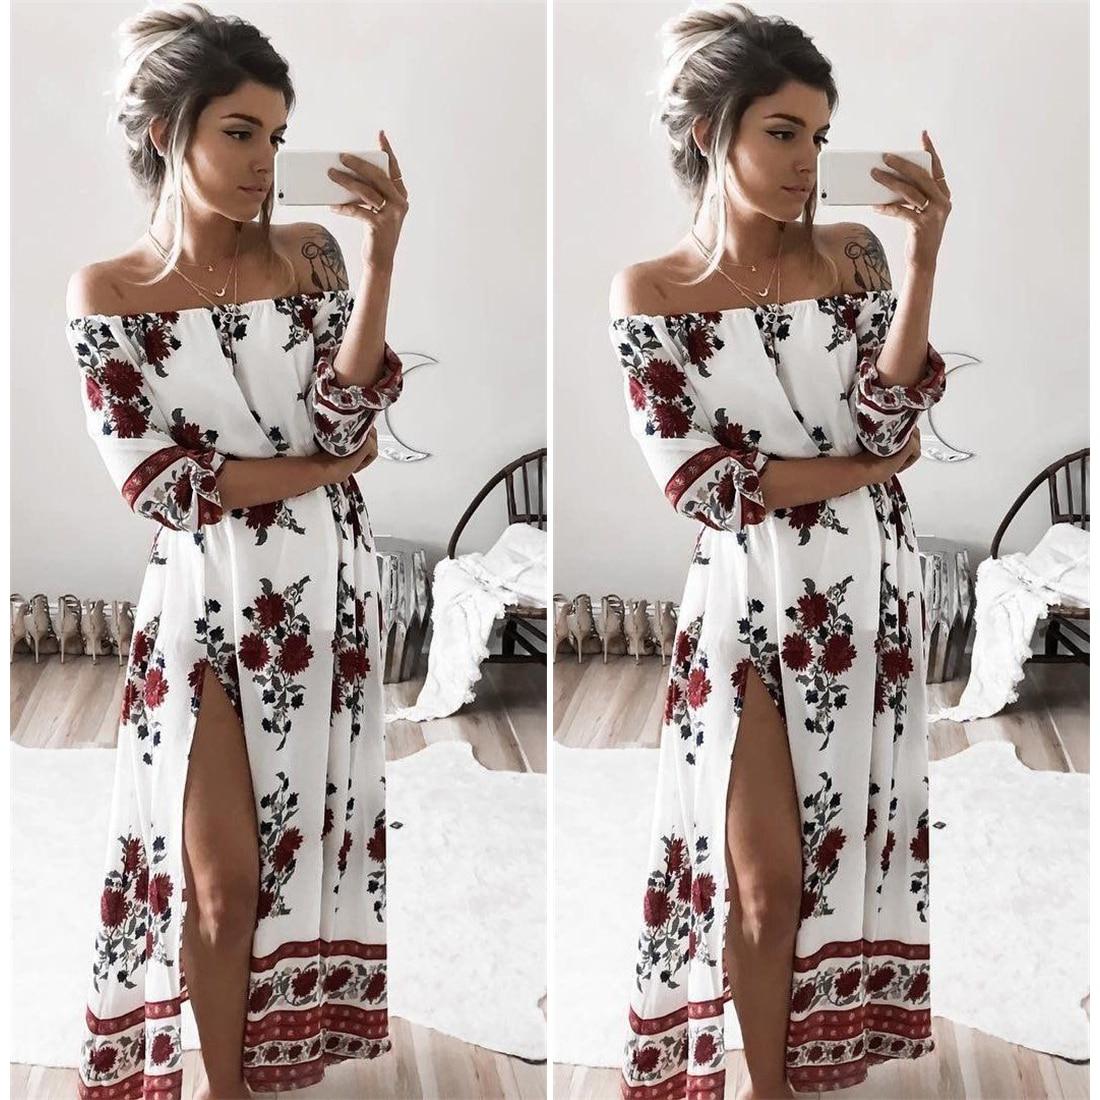 ec9a858b4784 Women Vintage Floral Printed 2017 Spring Summer Boho Beach Dresses ...